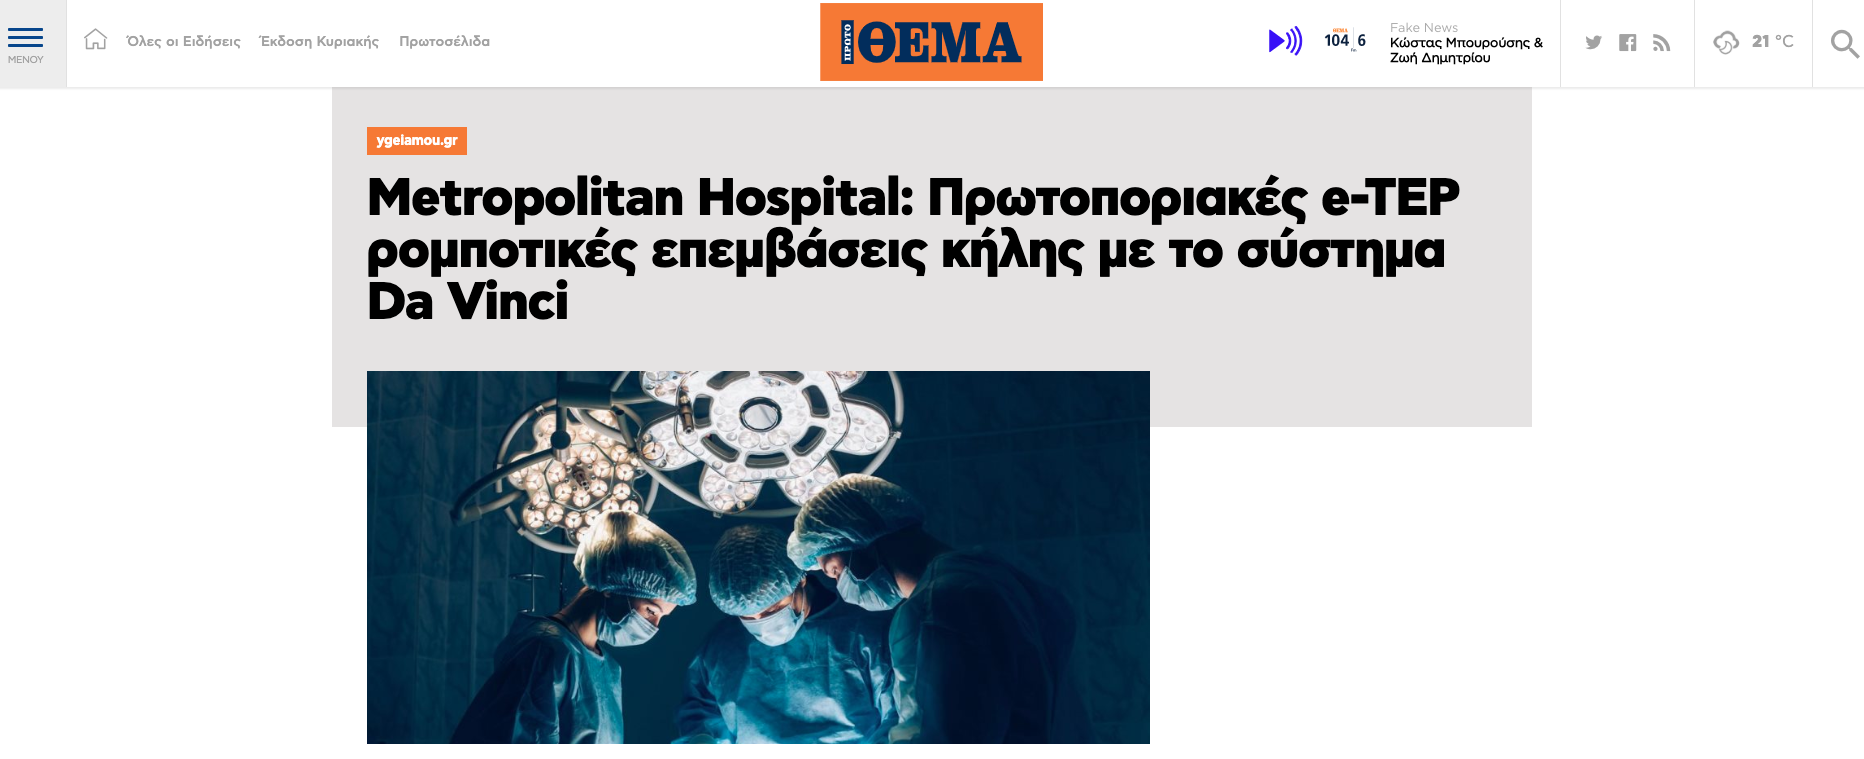 Metropolitan Hospital: Πρωτοποριακές e-TEP ρομποτικές επεμβάσεις κήλης με το σύστημα Da Vinci  Αρχική                          2019 11 07 19